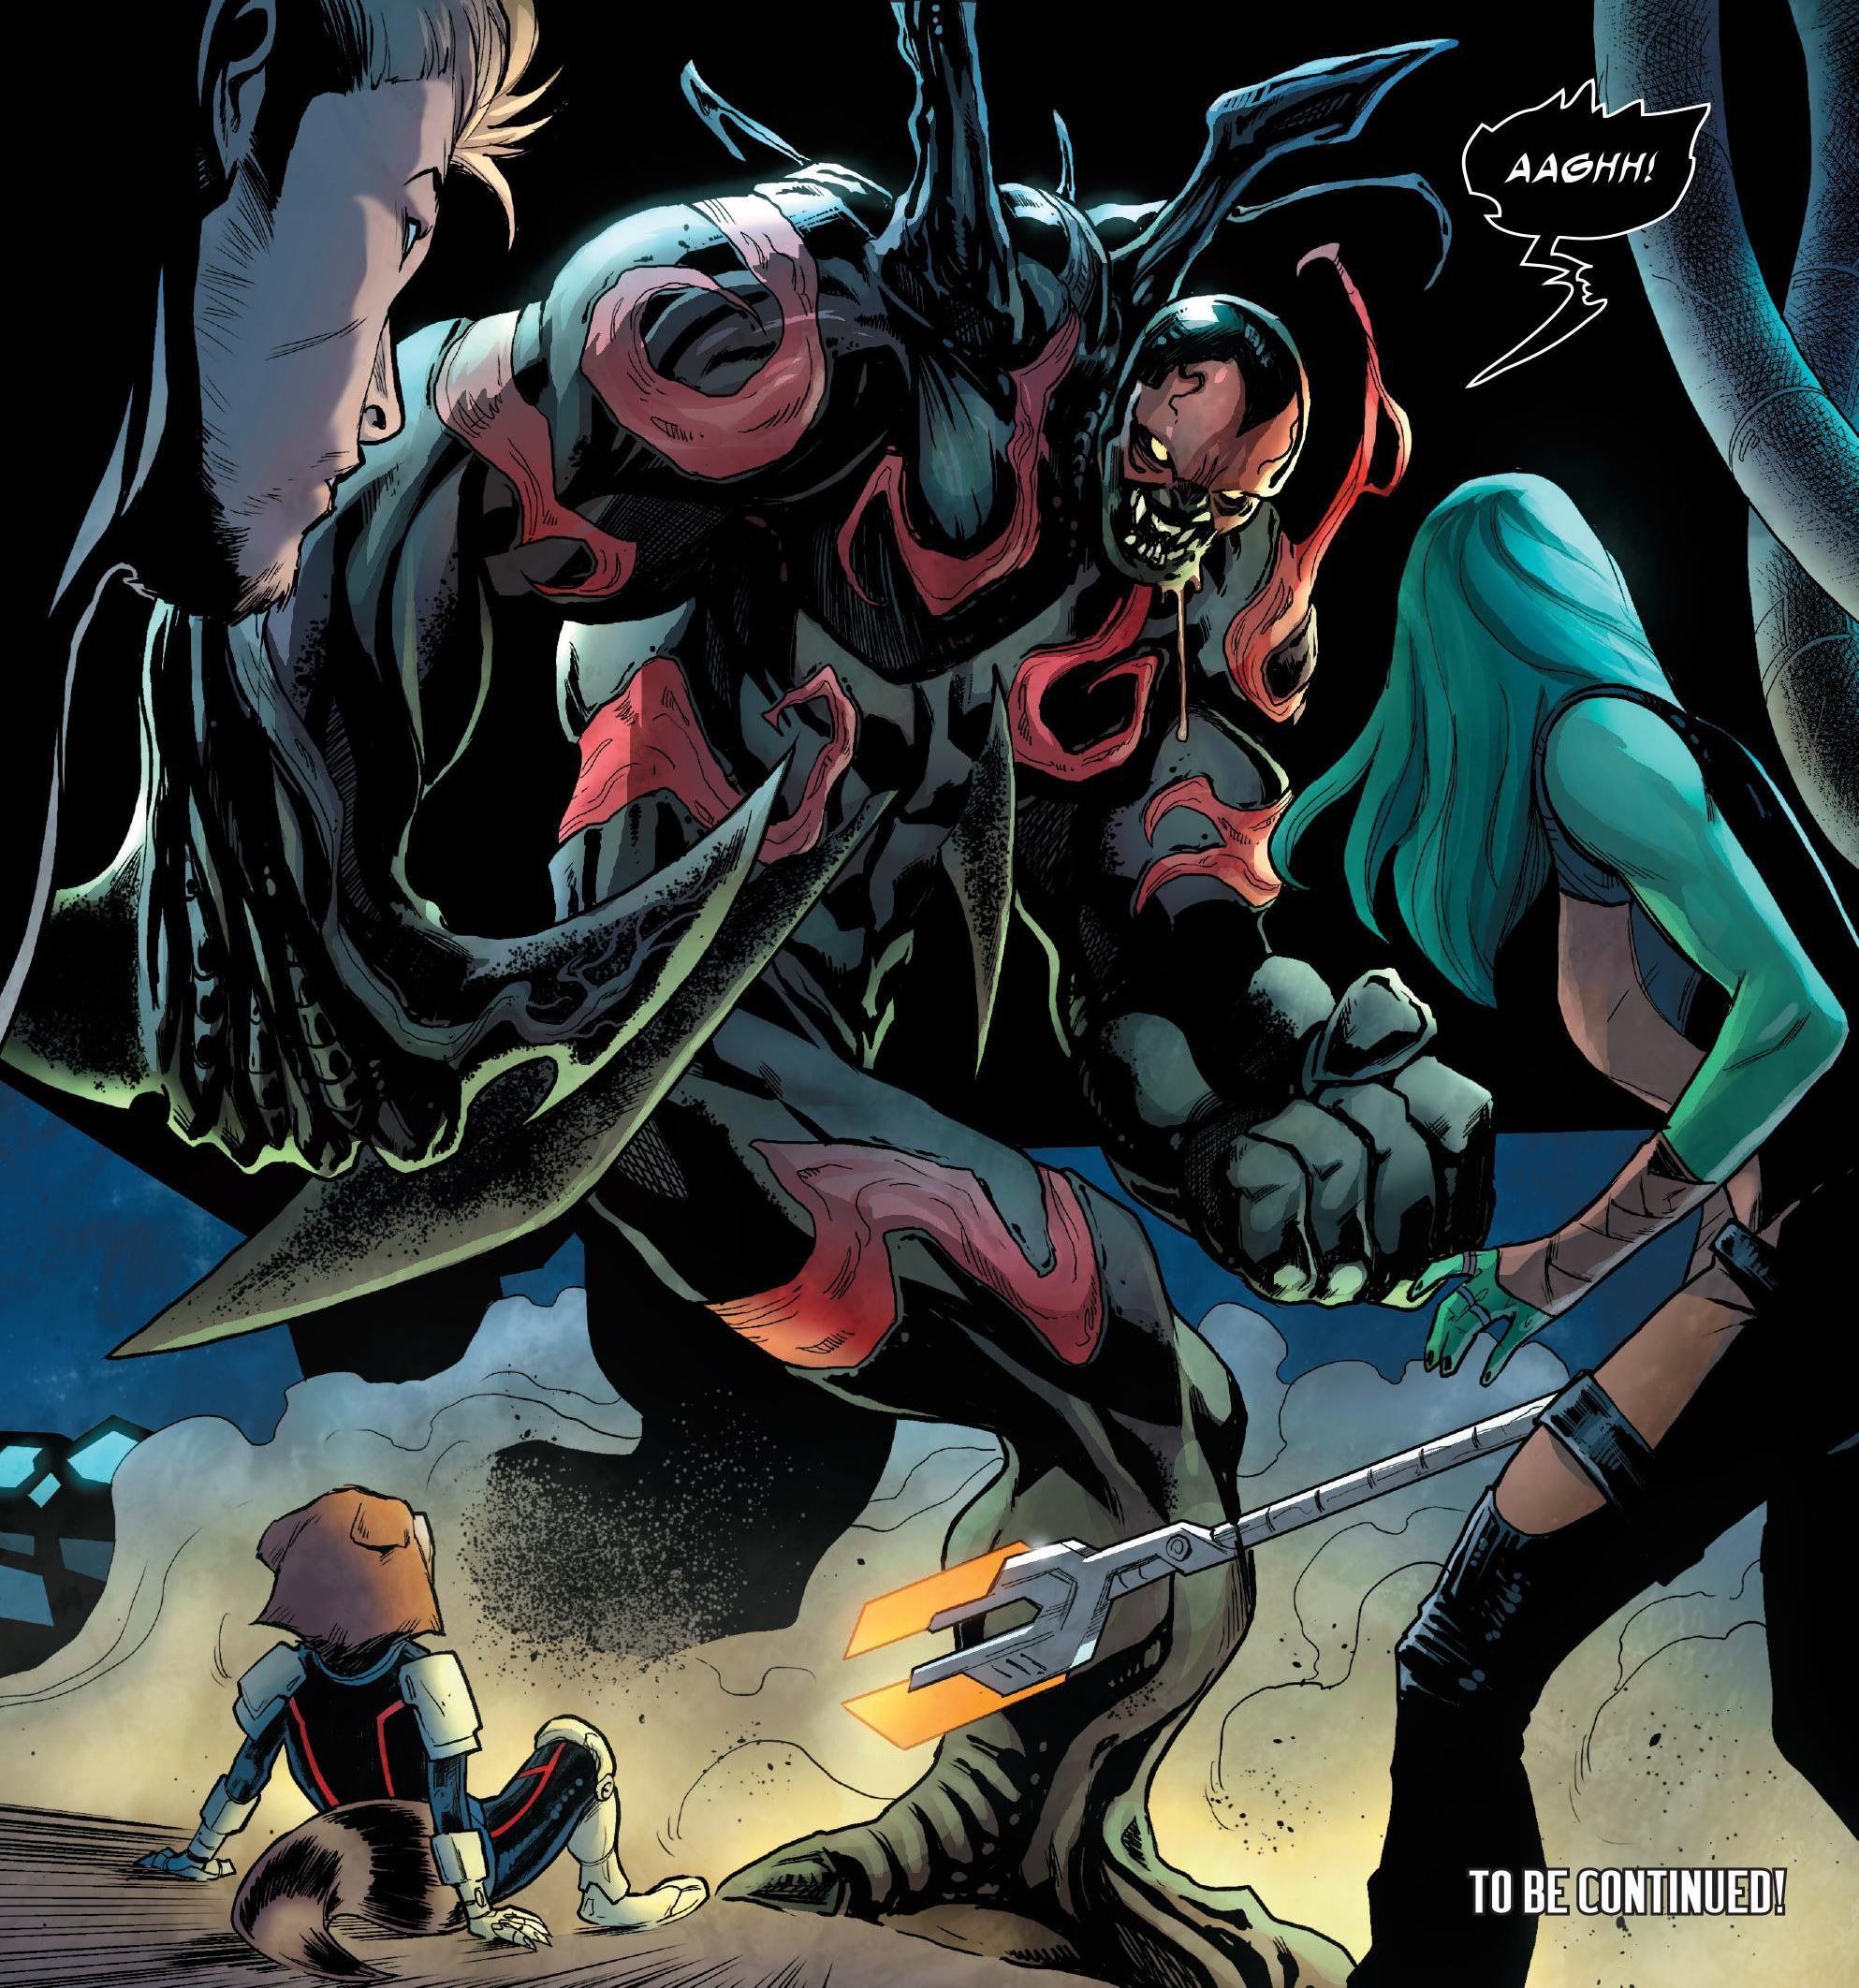 ... of the Galaxy #22 ... Mangaverse Spider Man Wallpaper